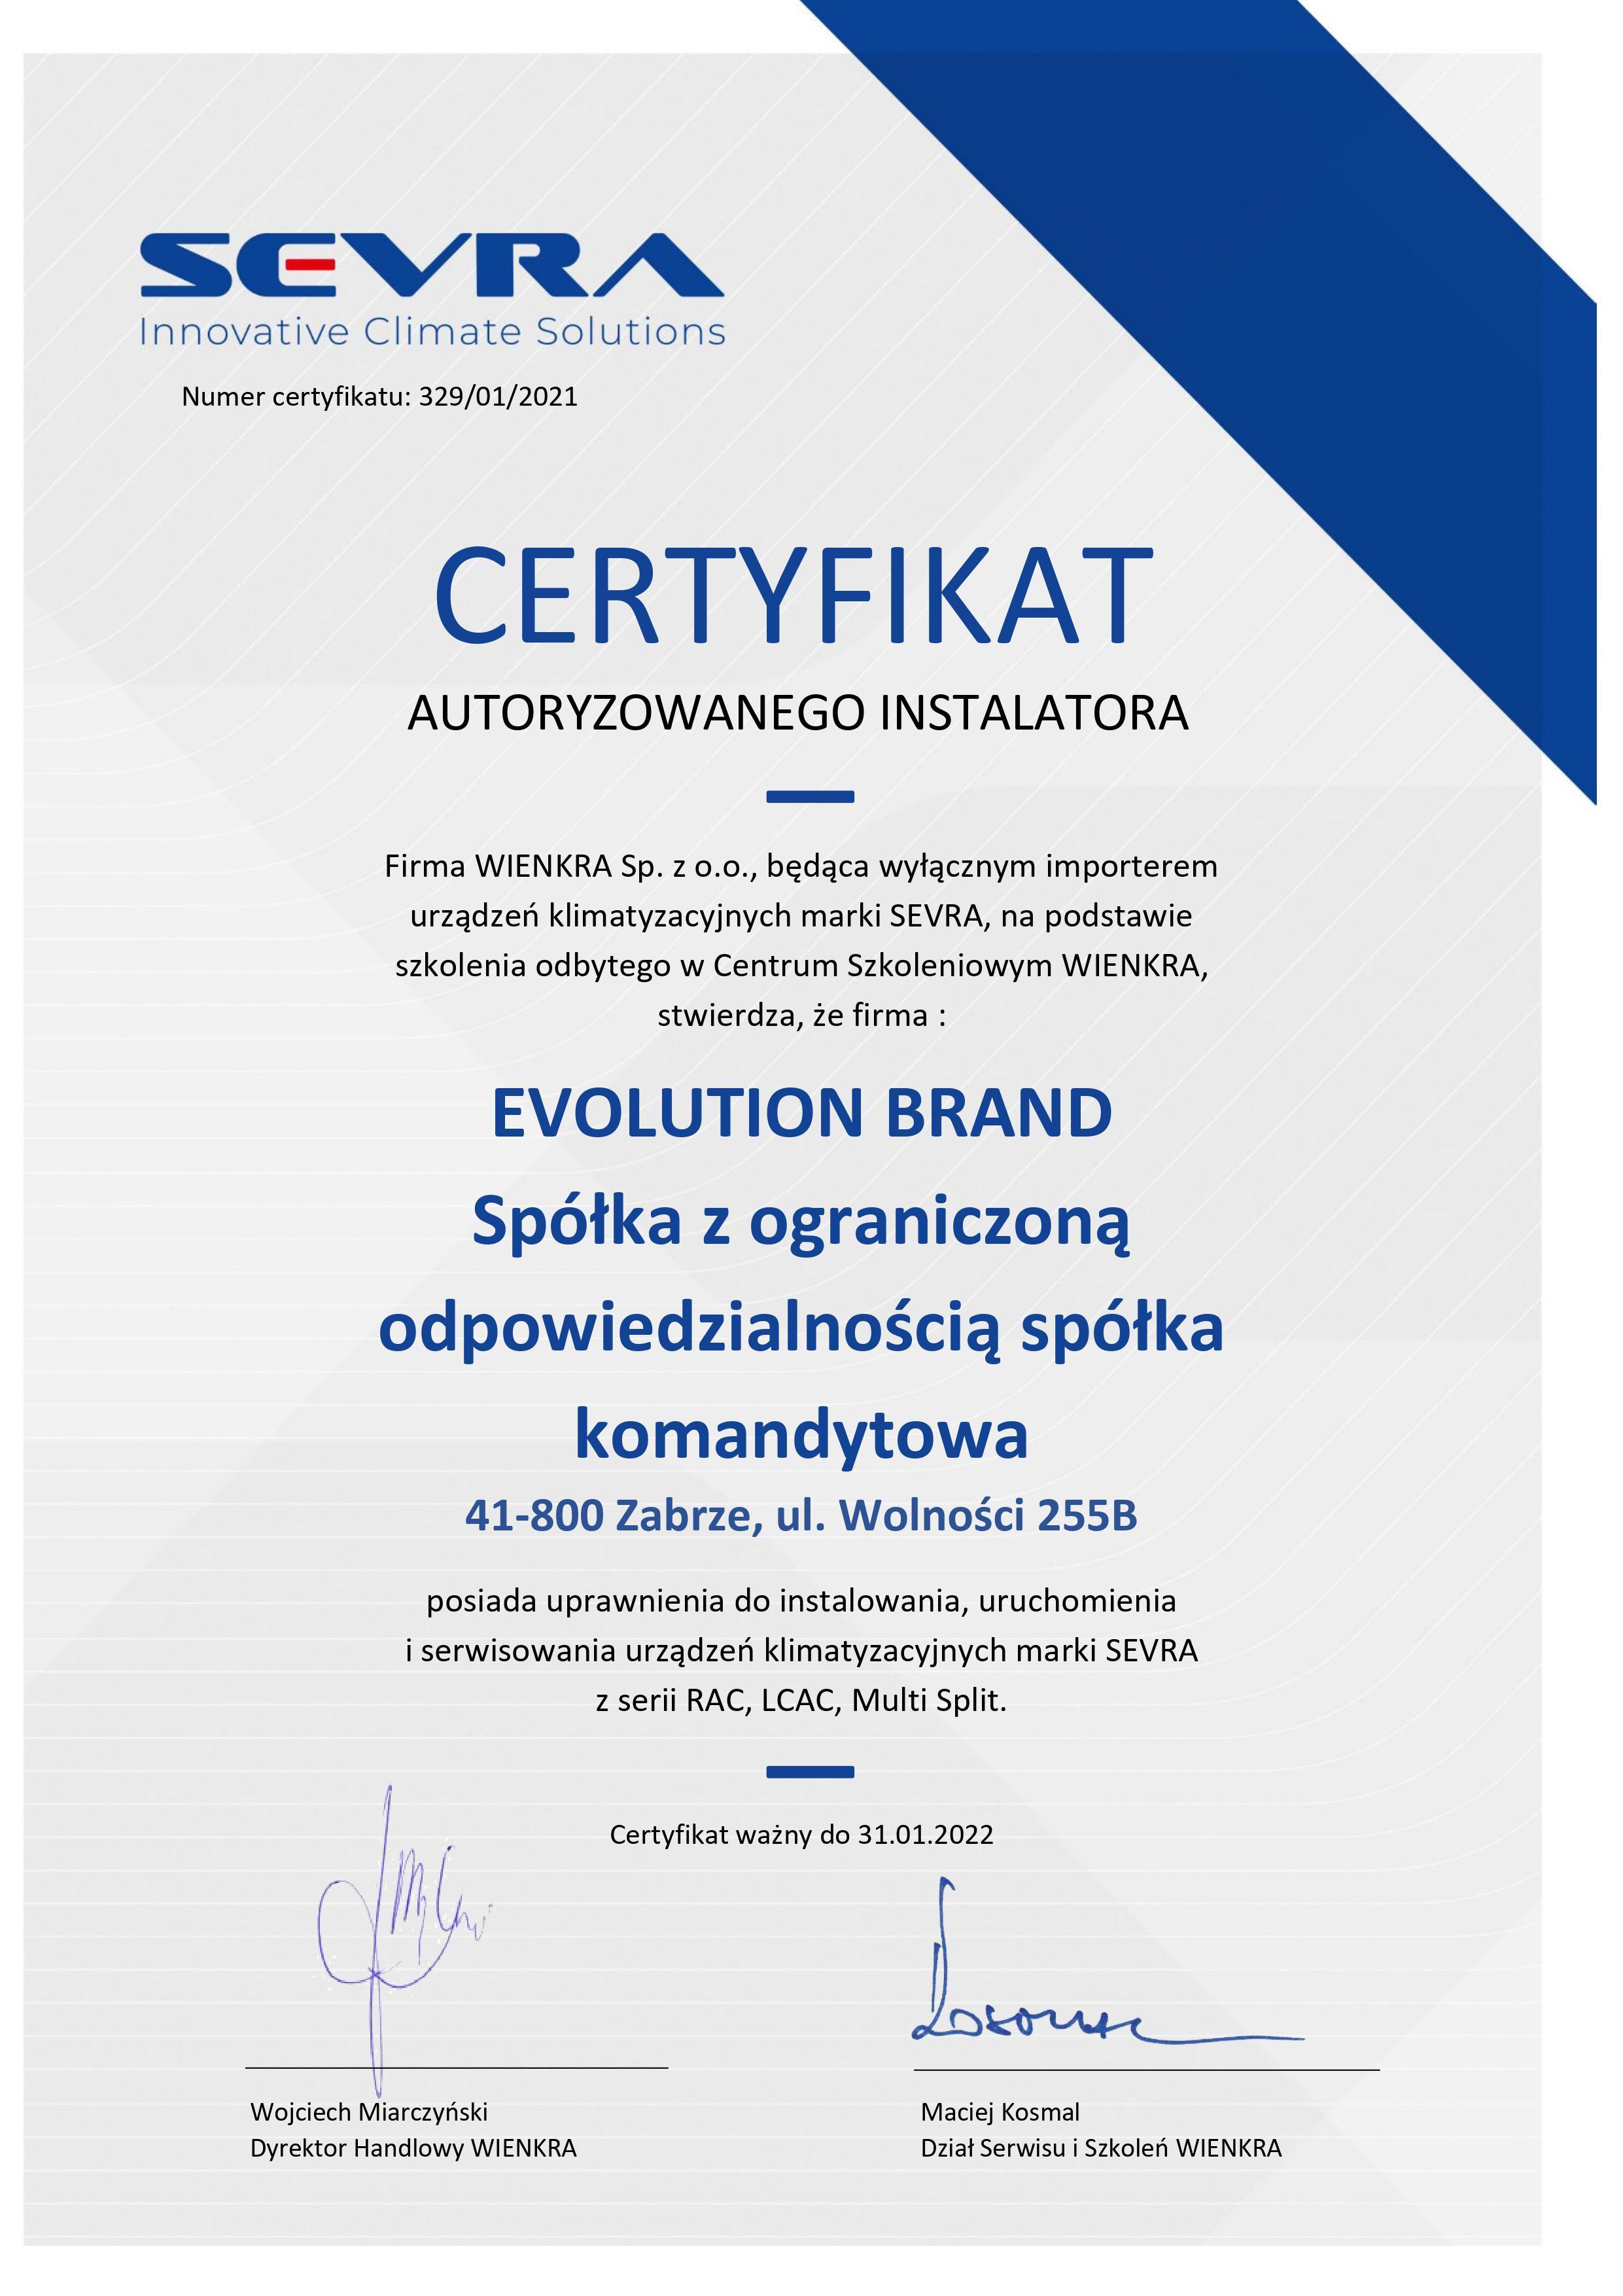 Certyfikat Sevra 2021